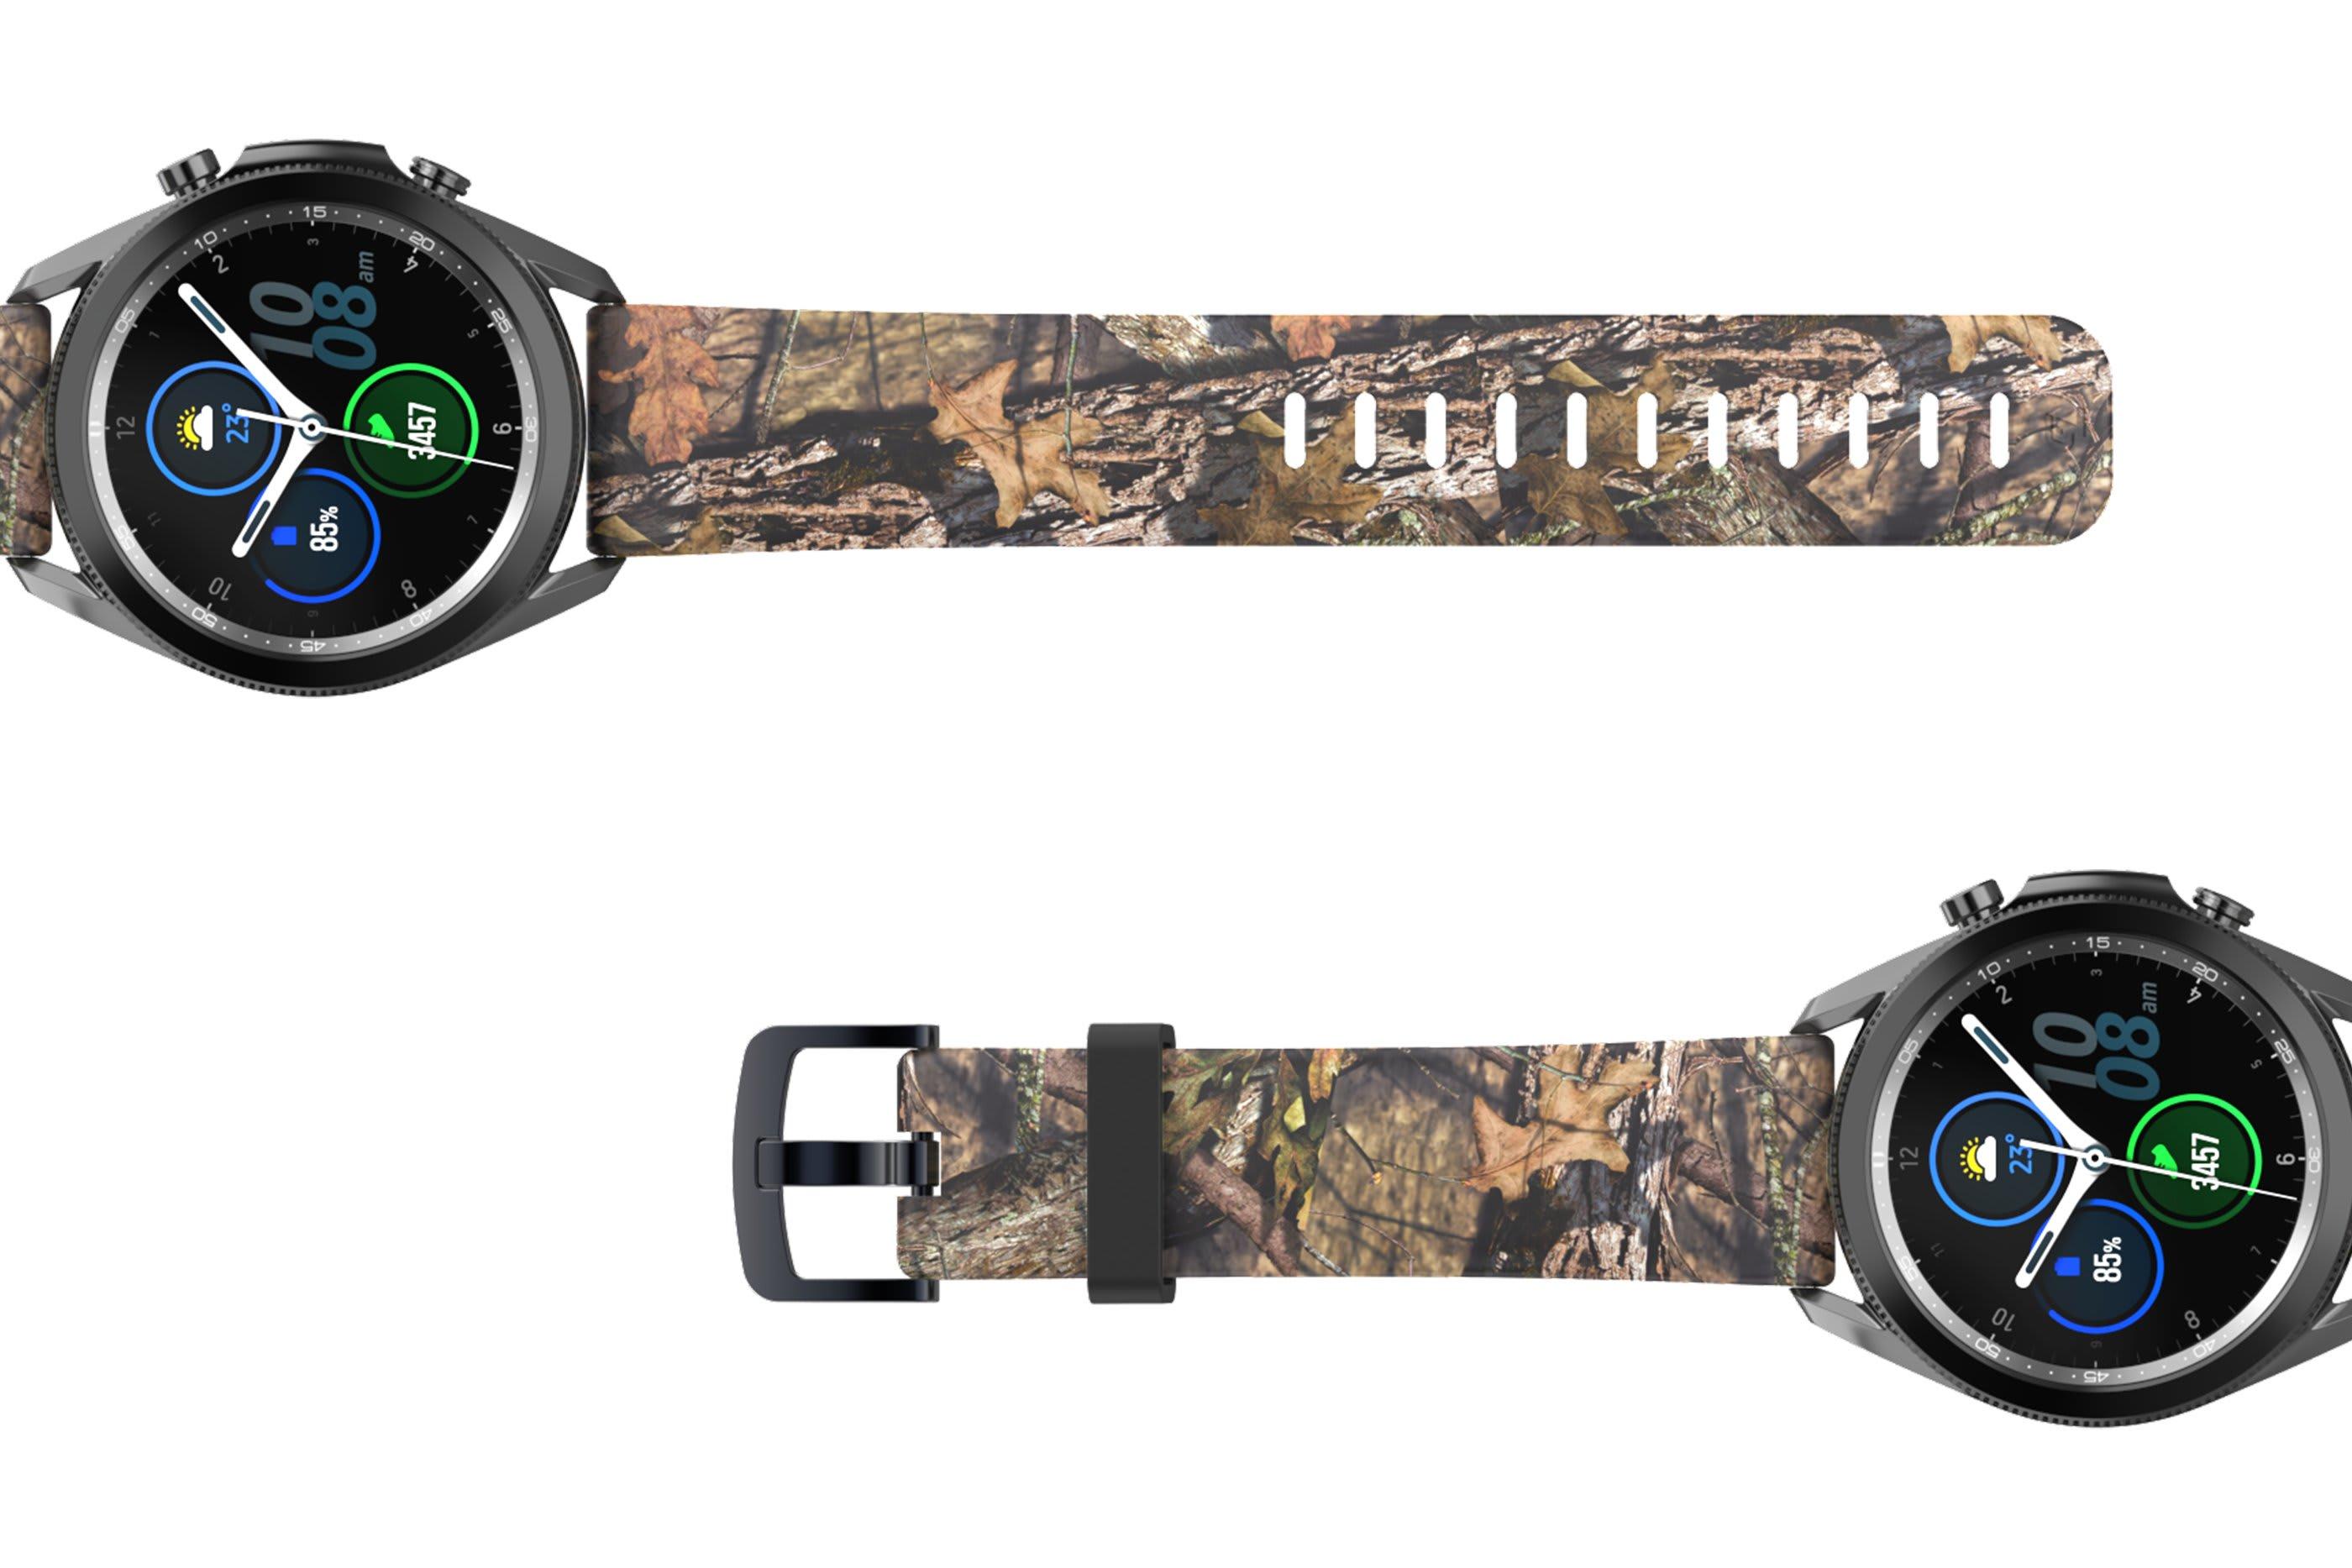 Mossy Oak Breakup Samsung 22mm Watch Band - Groove Life